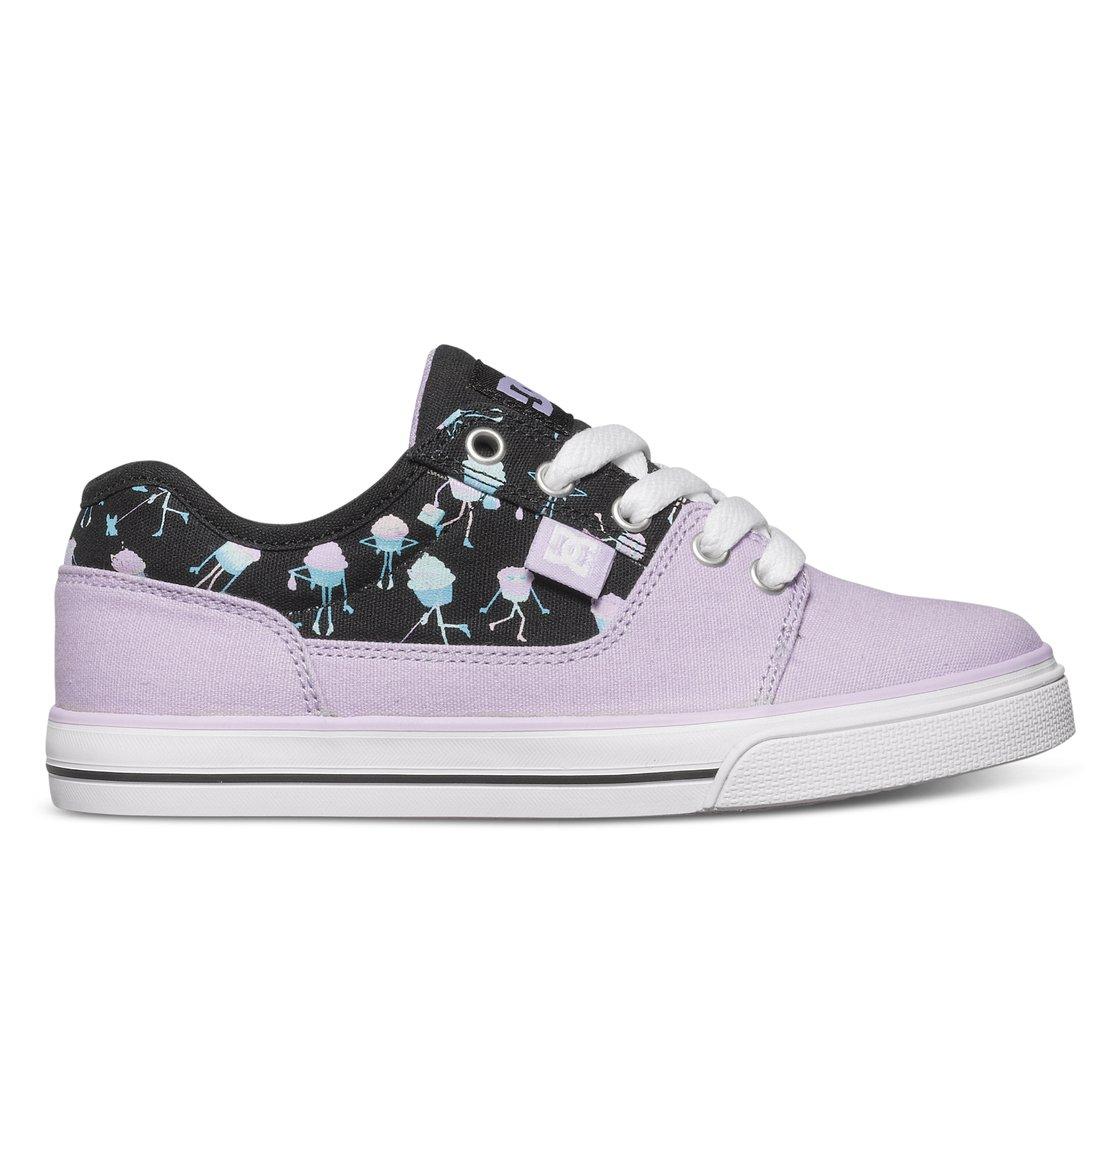 Tonik TX SE - Dcshoes������ ���� ��� ������� Tonik TX SE �� DC Shoes � ������� �� ��������� ����� 2015�. ��������������: ���� �� ������������ ��������, ��������������� ���, ���������� ������������ �� ���� ���������������� �����.<br>